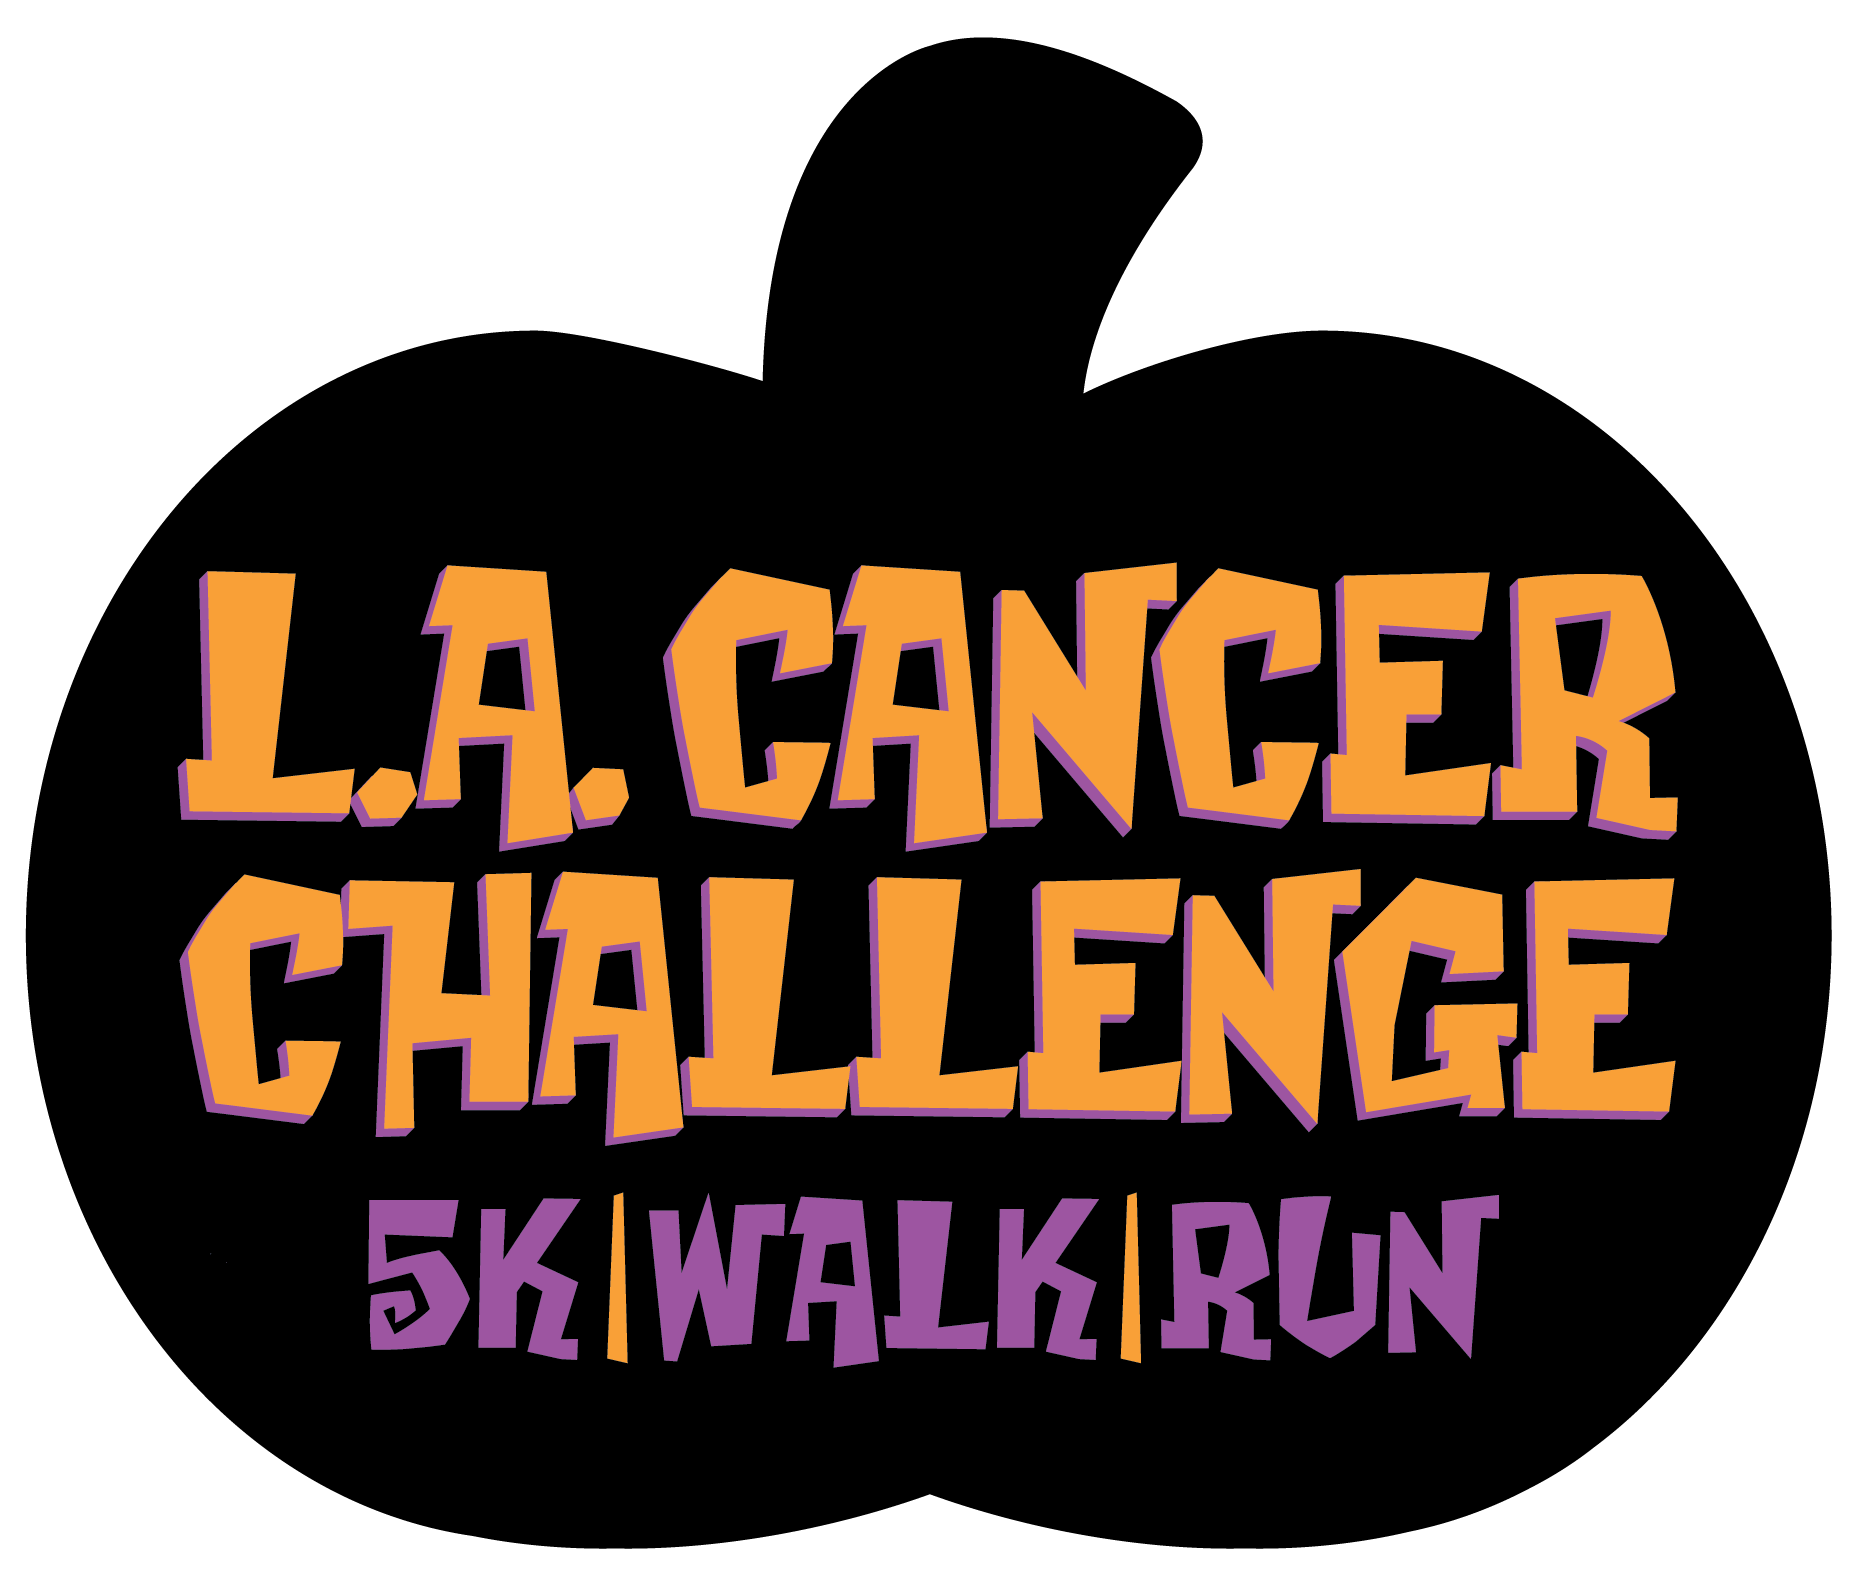 LA Cancer Challenge 5K Walk/Run